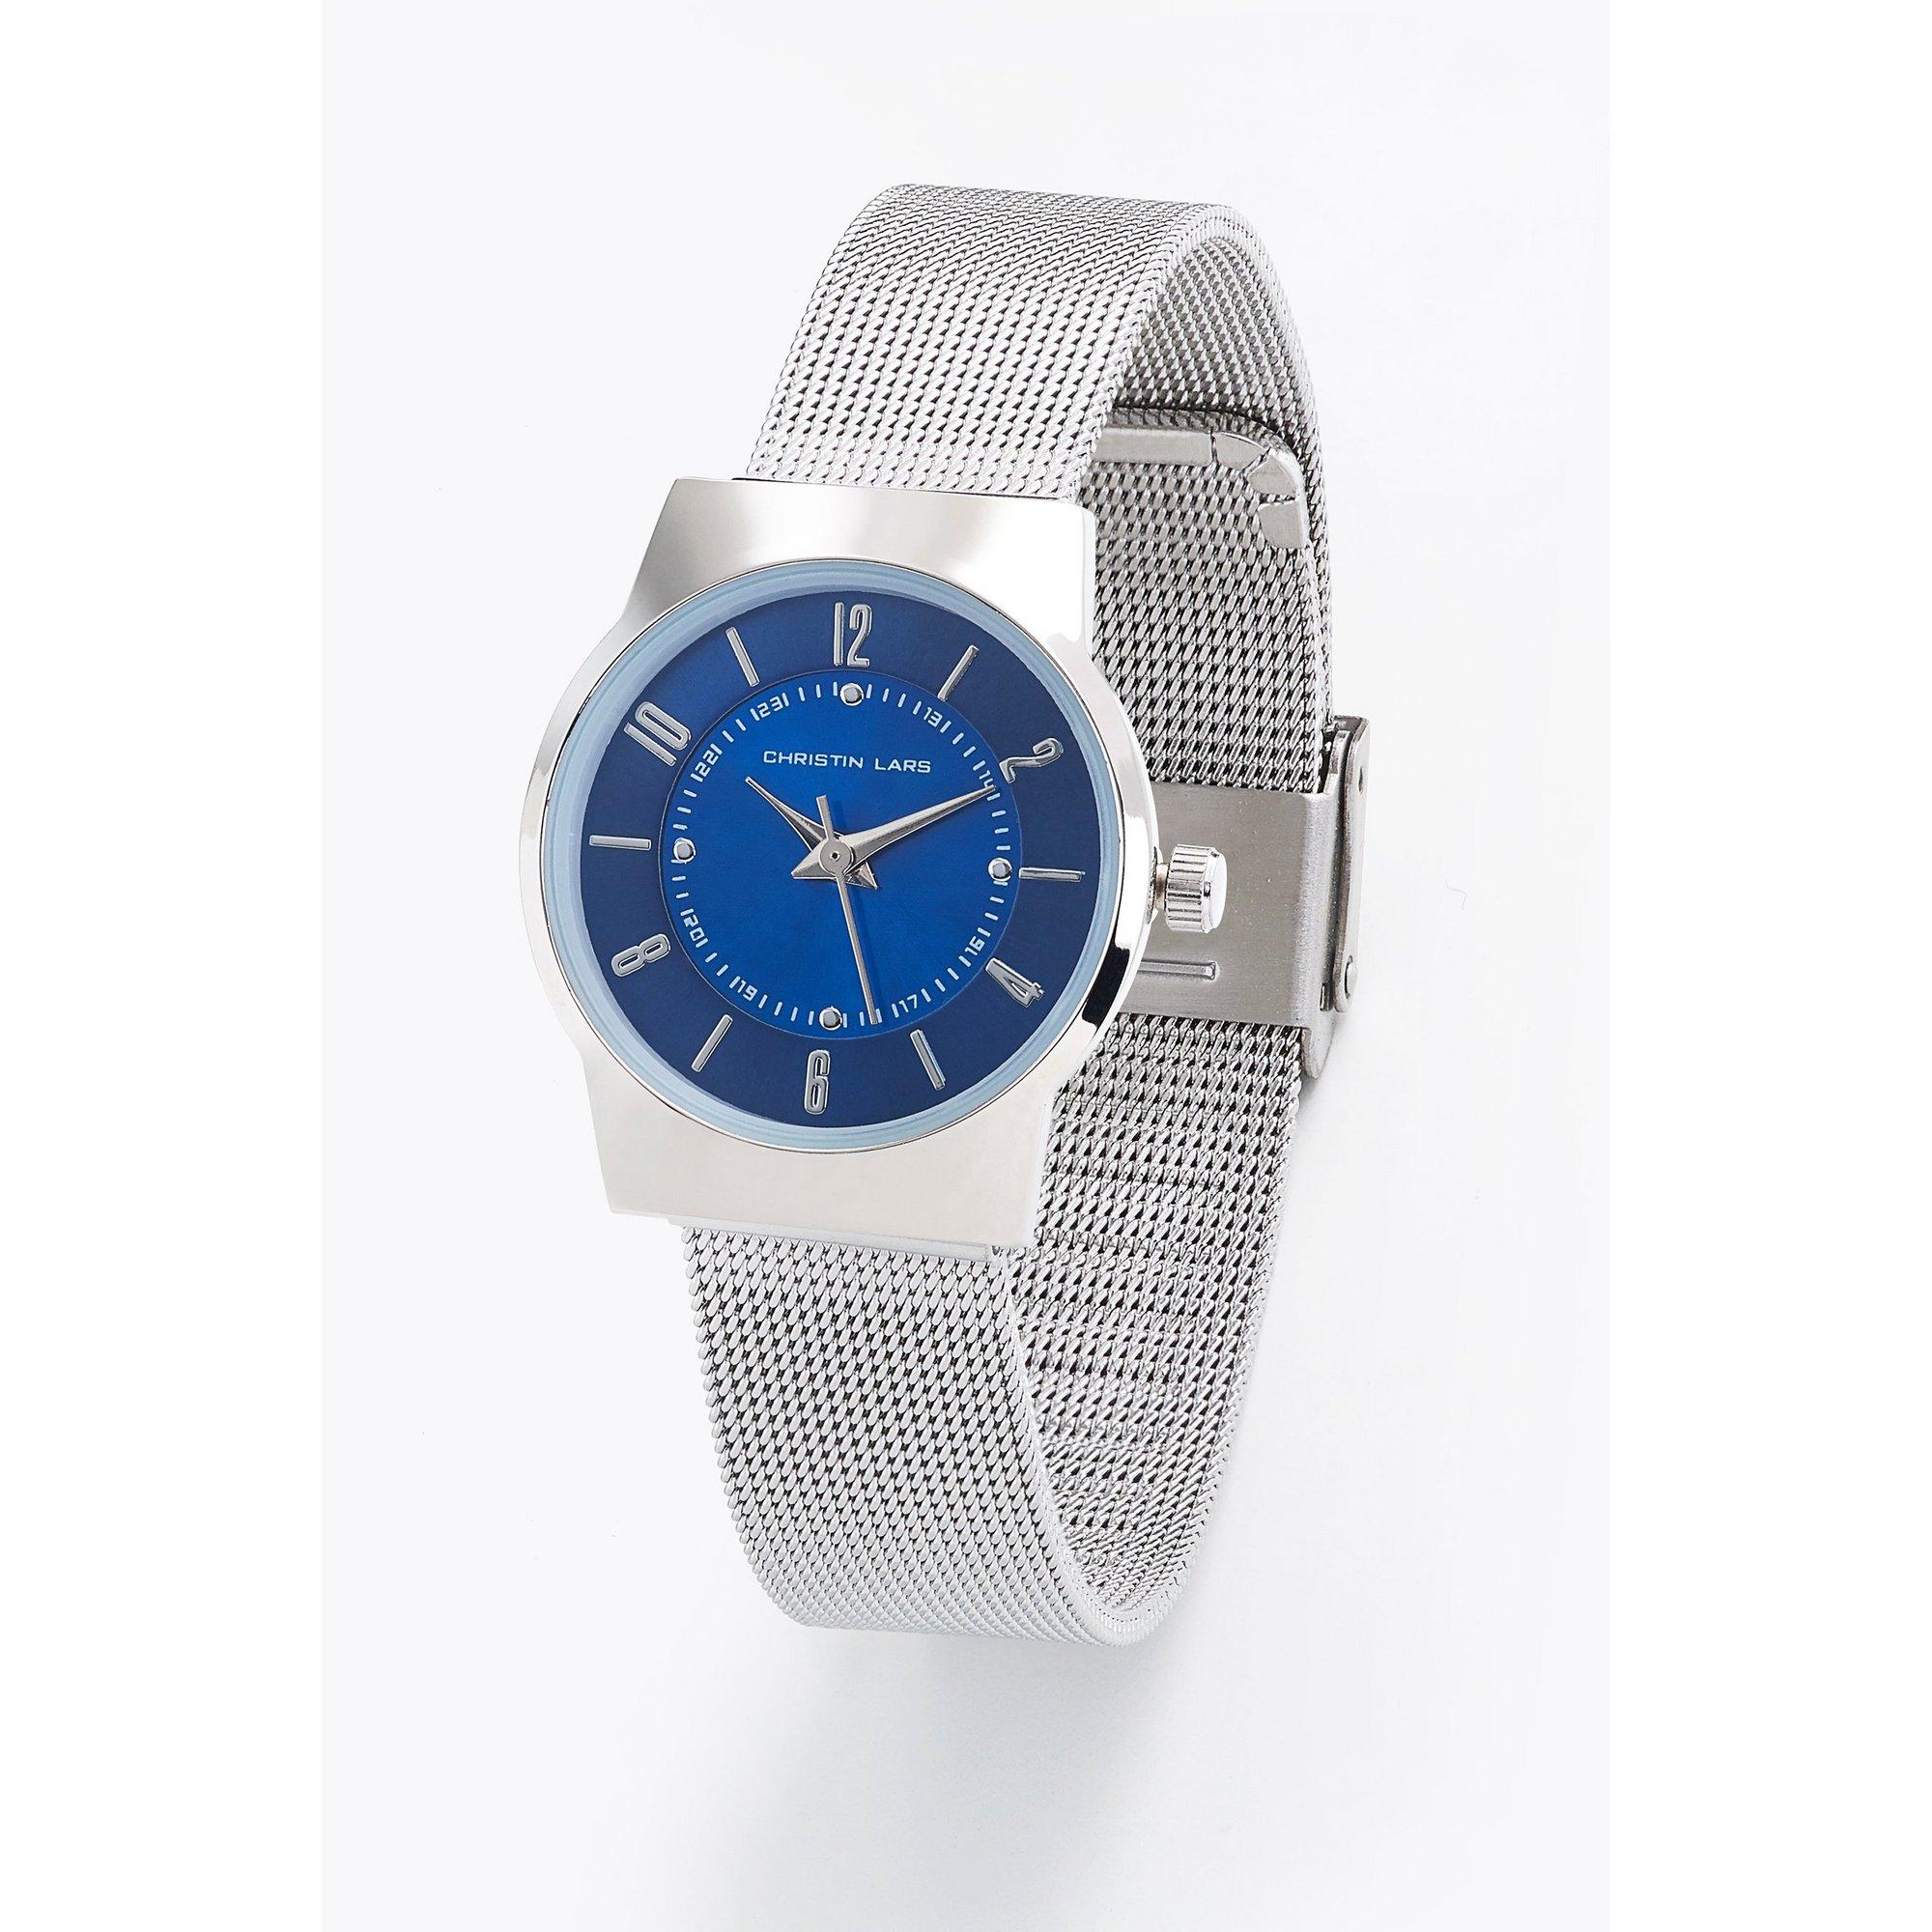 Image of Christin Lars Silver Tone Bracelet Watch